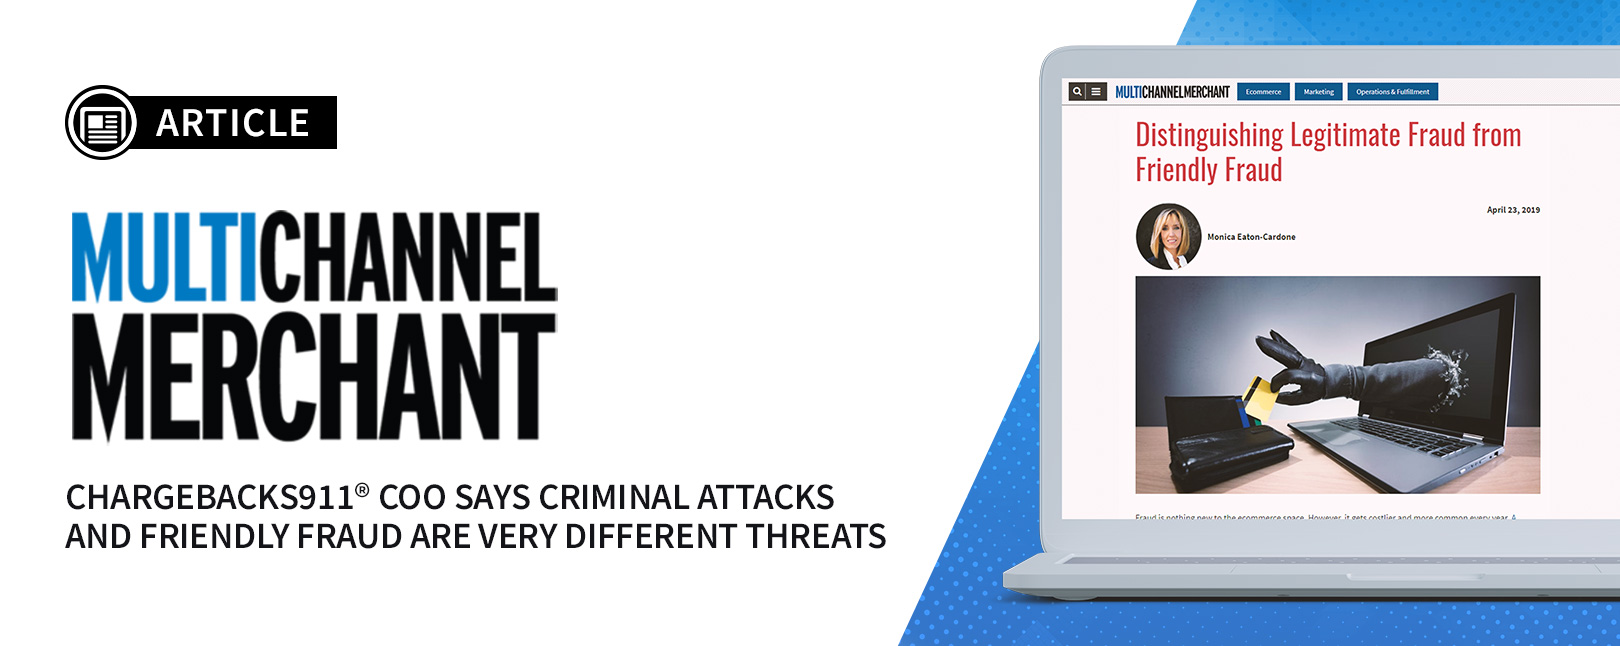 Press - Multichannel Merchant - Distinguishing Legitimate Fraud from Friendly Fraud-blog